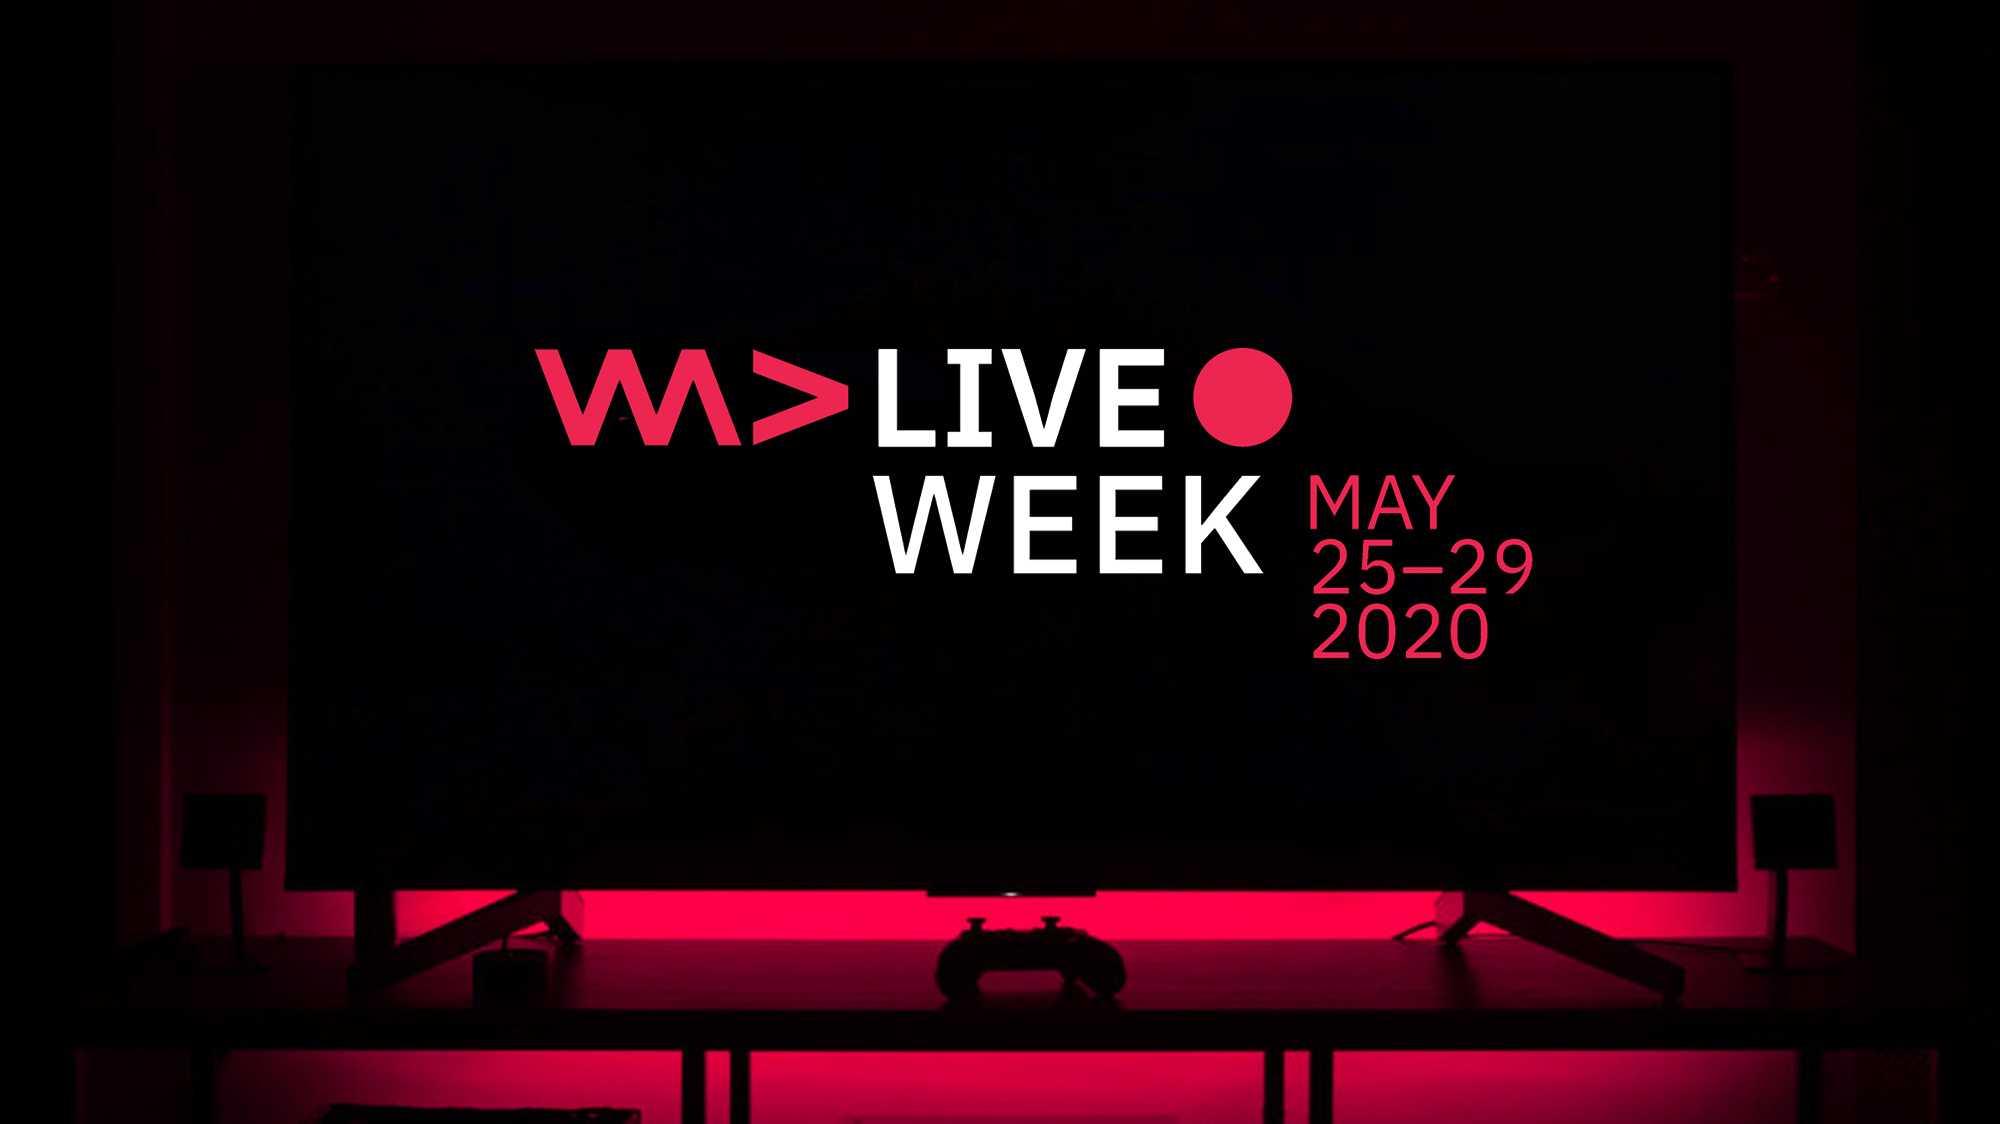 Am Donnerstag online: WeAreDevelopers Live Week – u.a. mit Web APIs, RxJS und ML